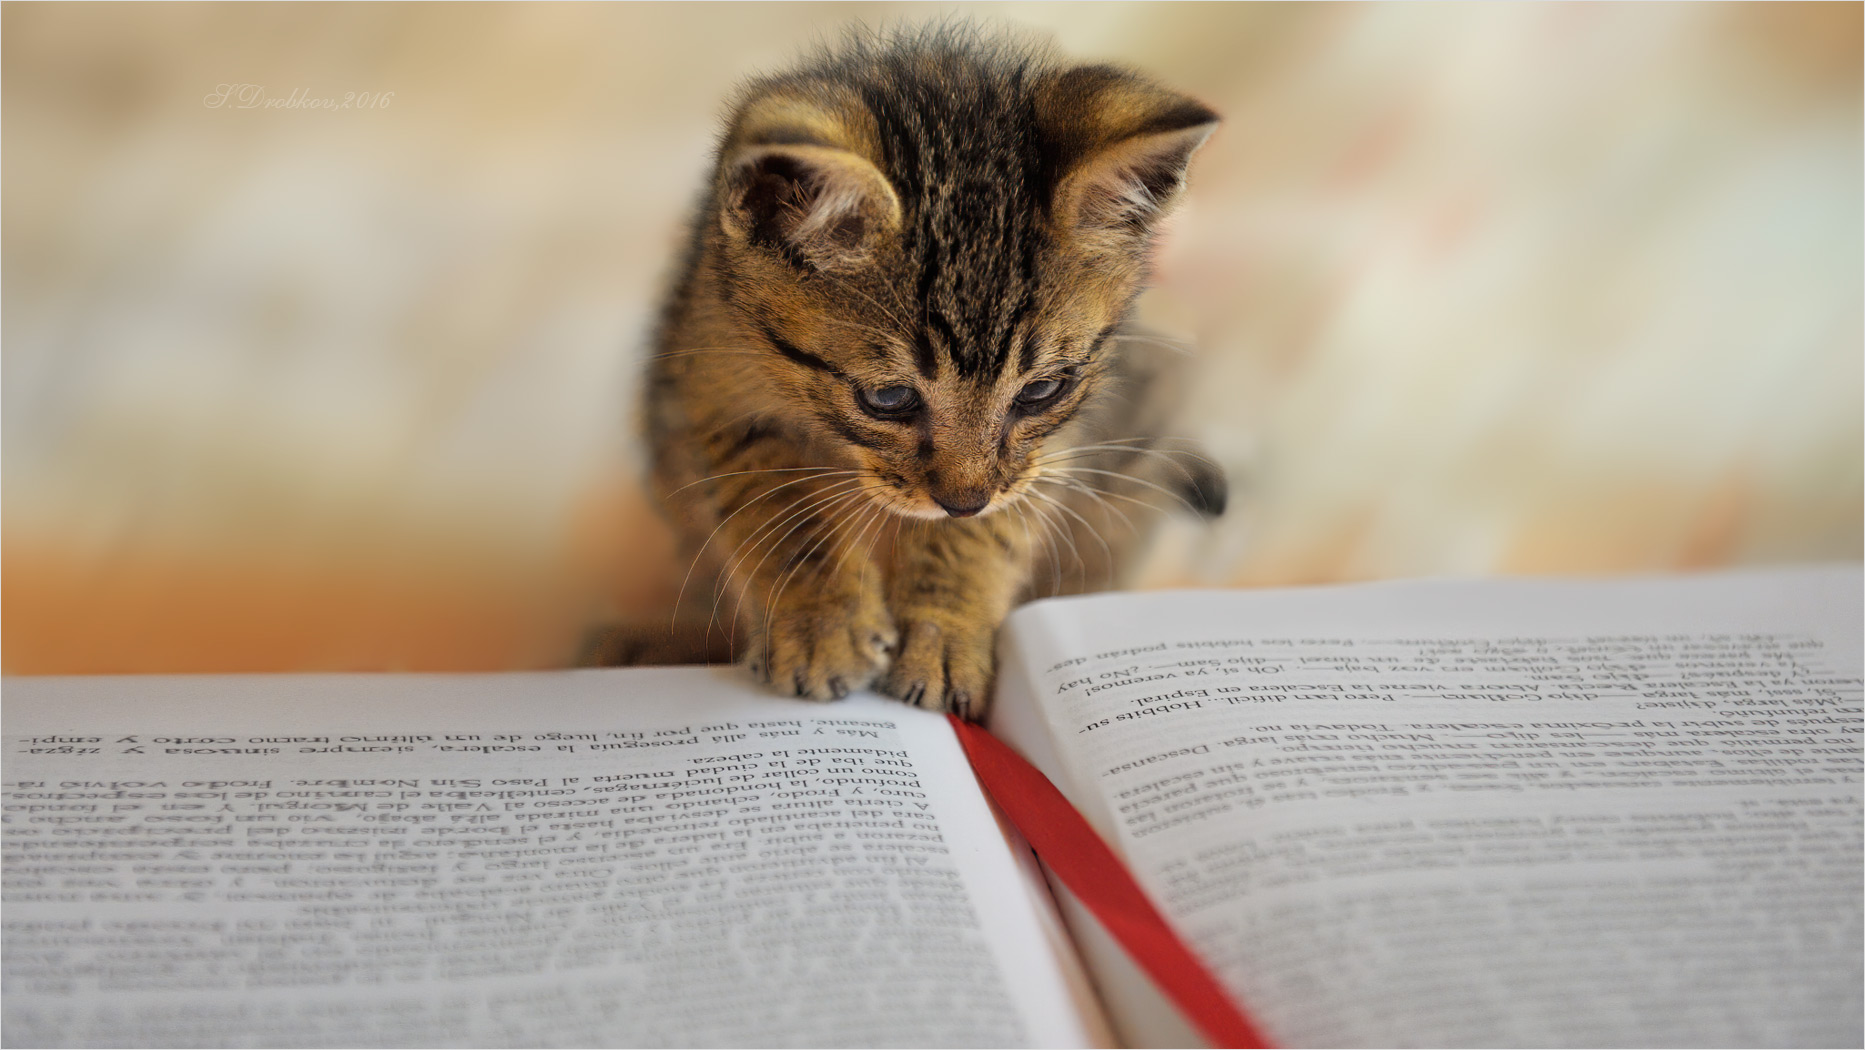 Saber leer